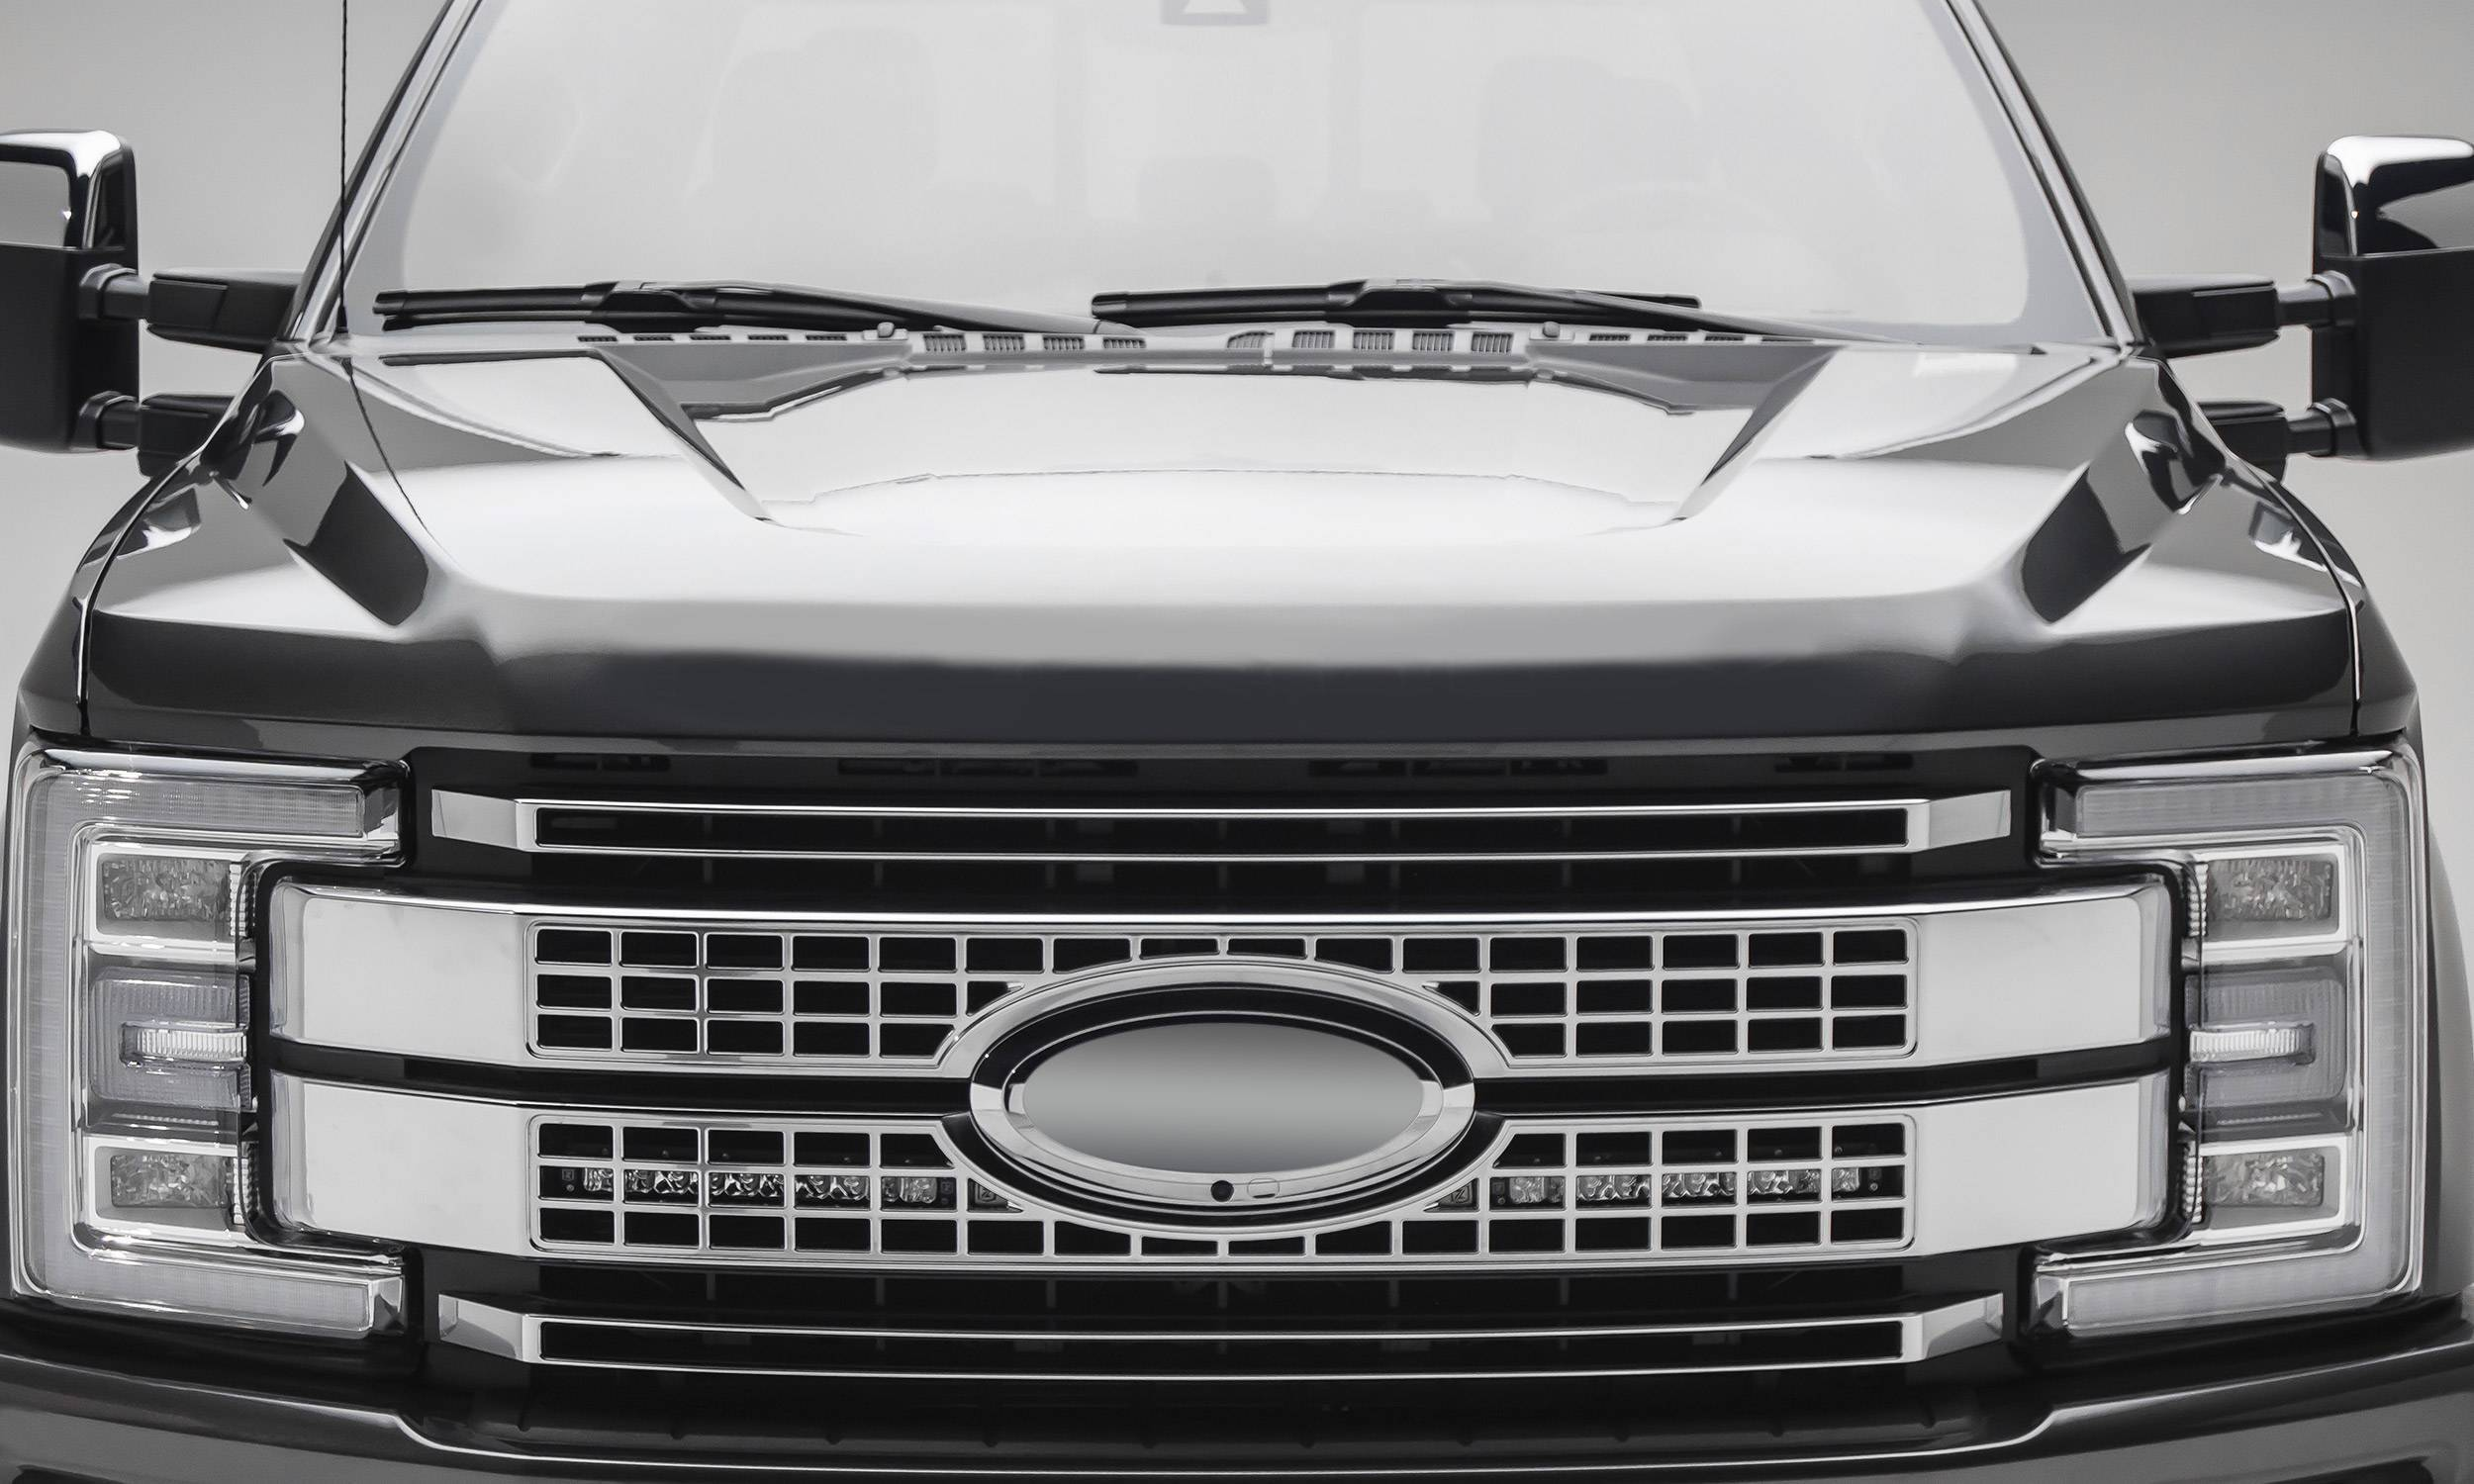 ZROADZ                                             - 2017-2019 Ford Super Duty Platinum OEM Grille LED Kit with (2) 10 Inch LED Single Row Slim Light Bars - PN #Z415671-KIT